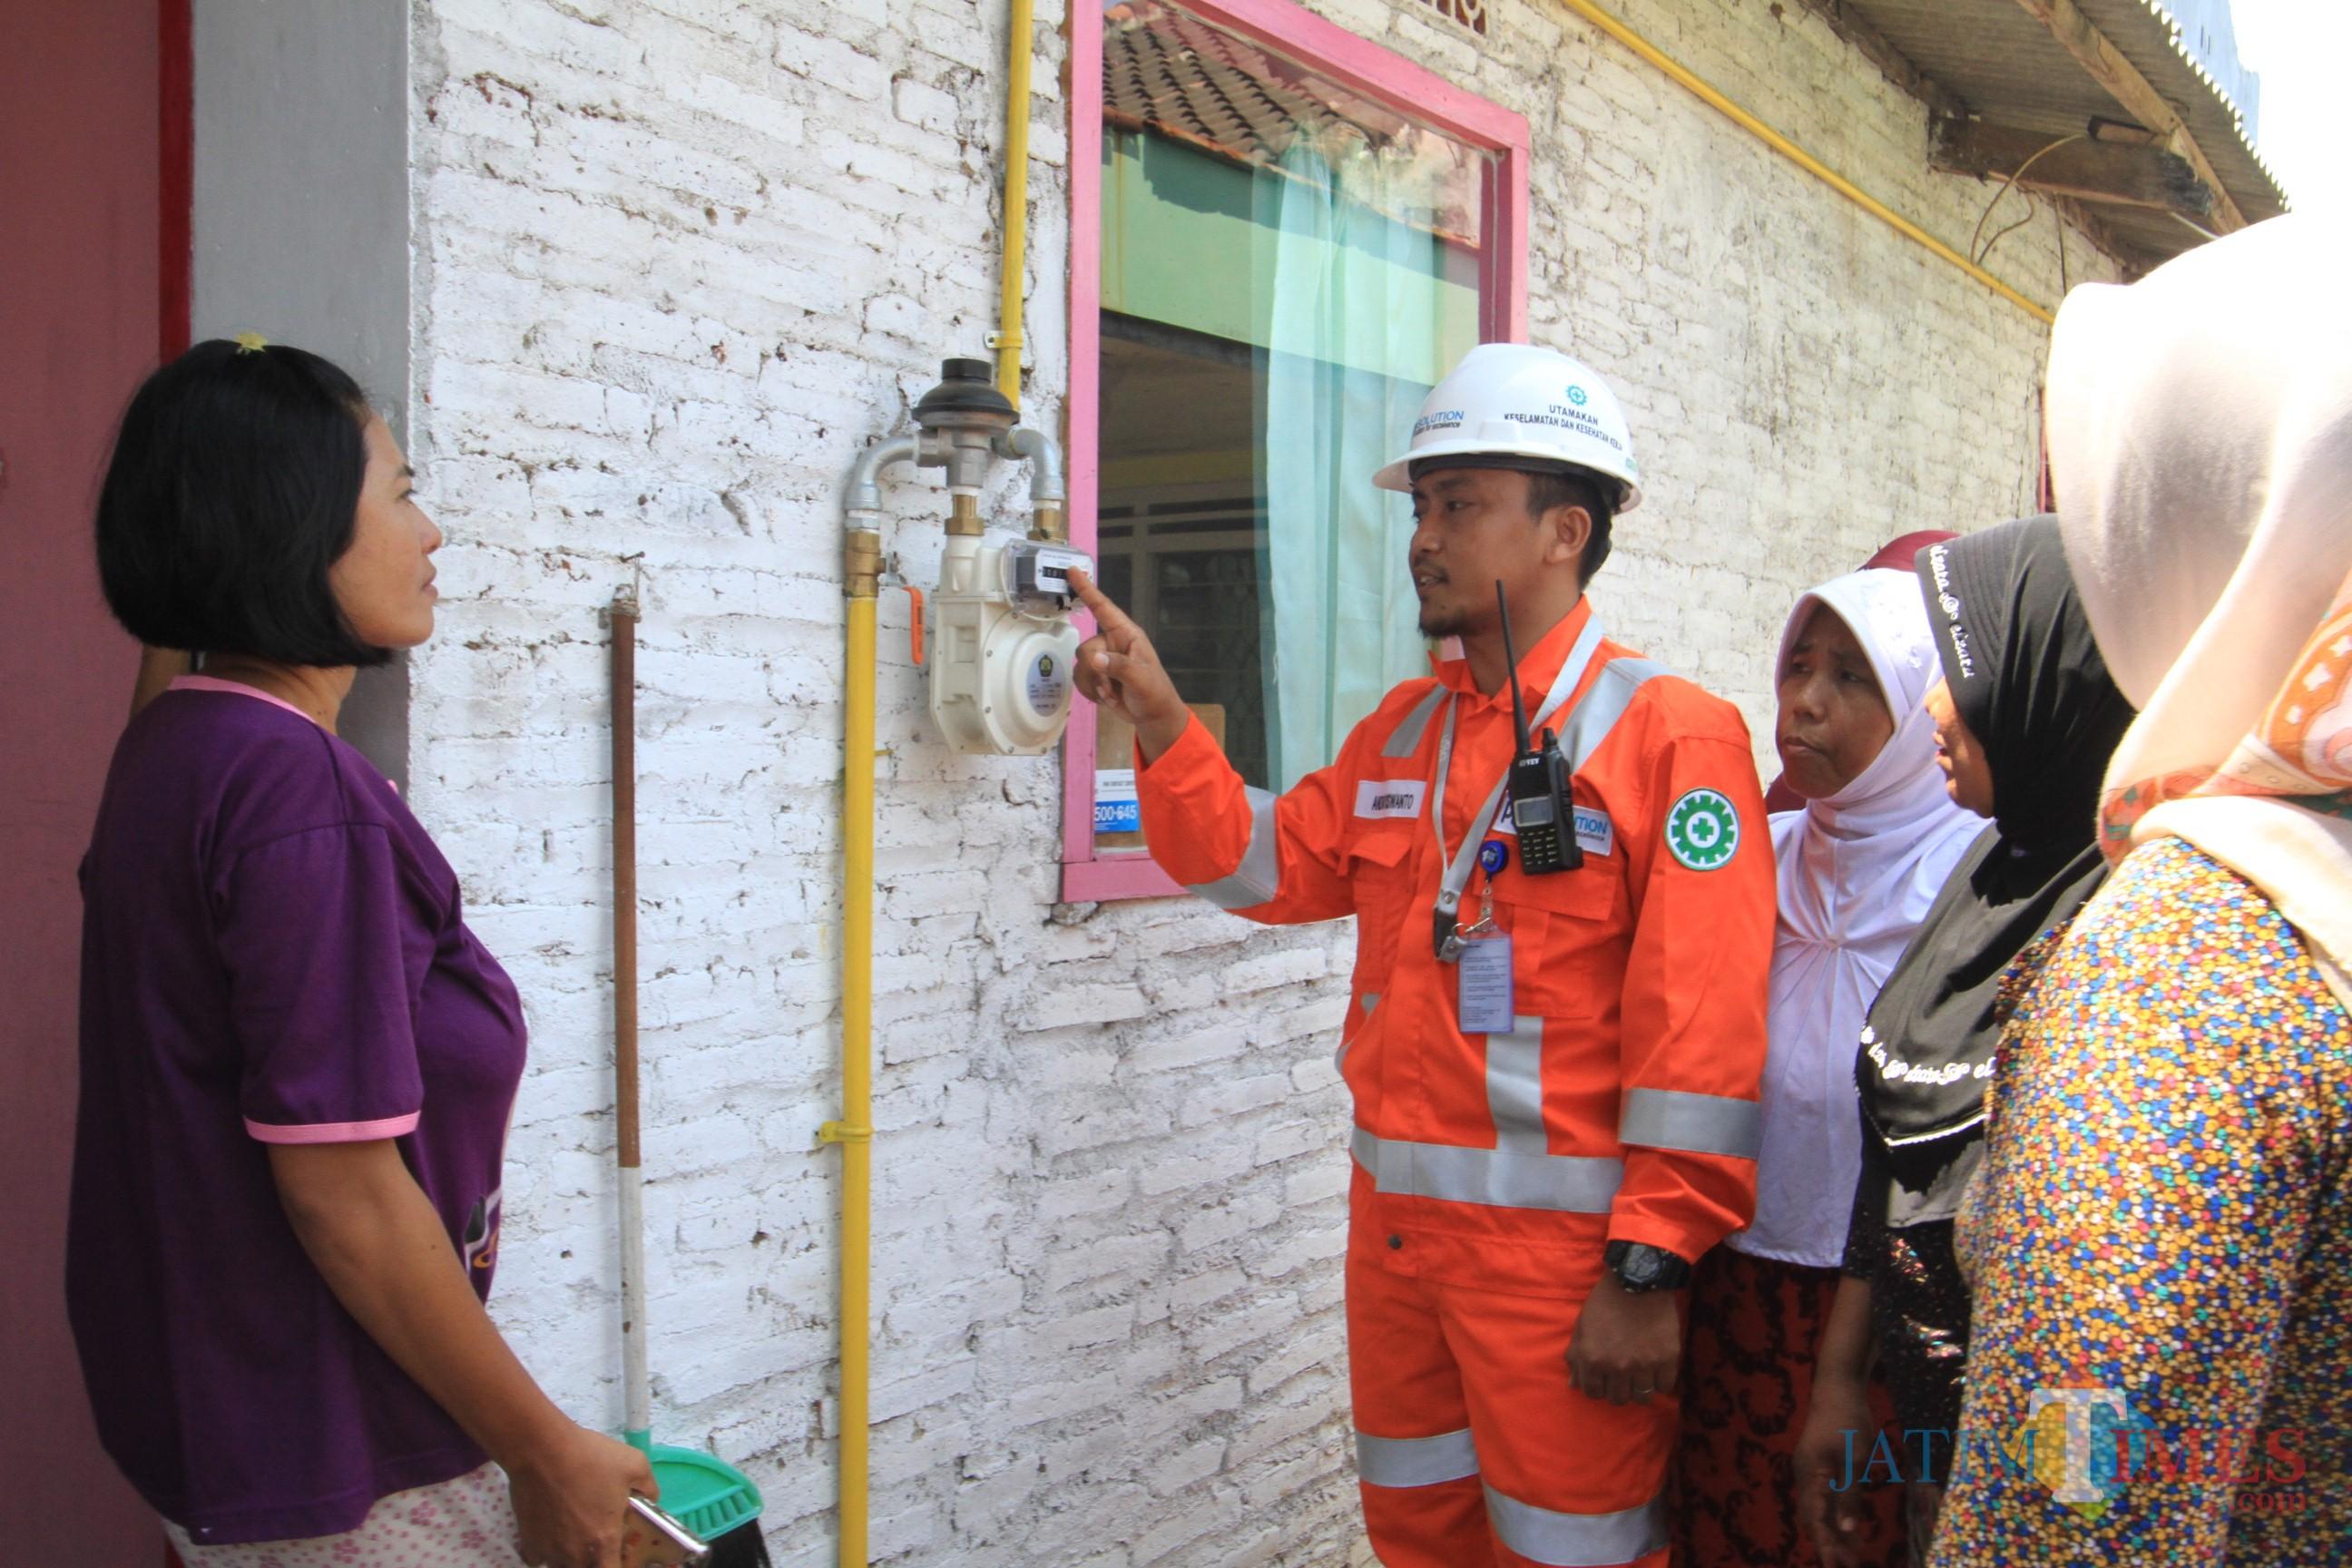 Sejumlah warga Kelurahan Jati, Kecamatan Mayangan, saat mendapat penjelasan dari petugas Jargas  (Agus Salam/JatimTIMES)